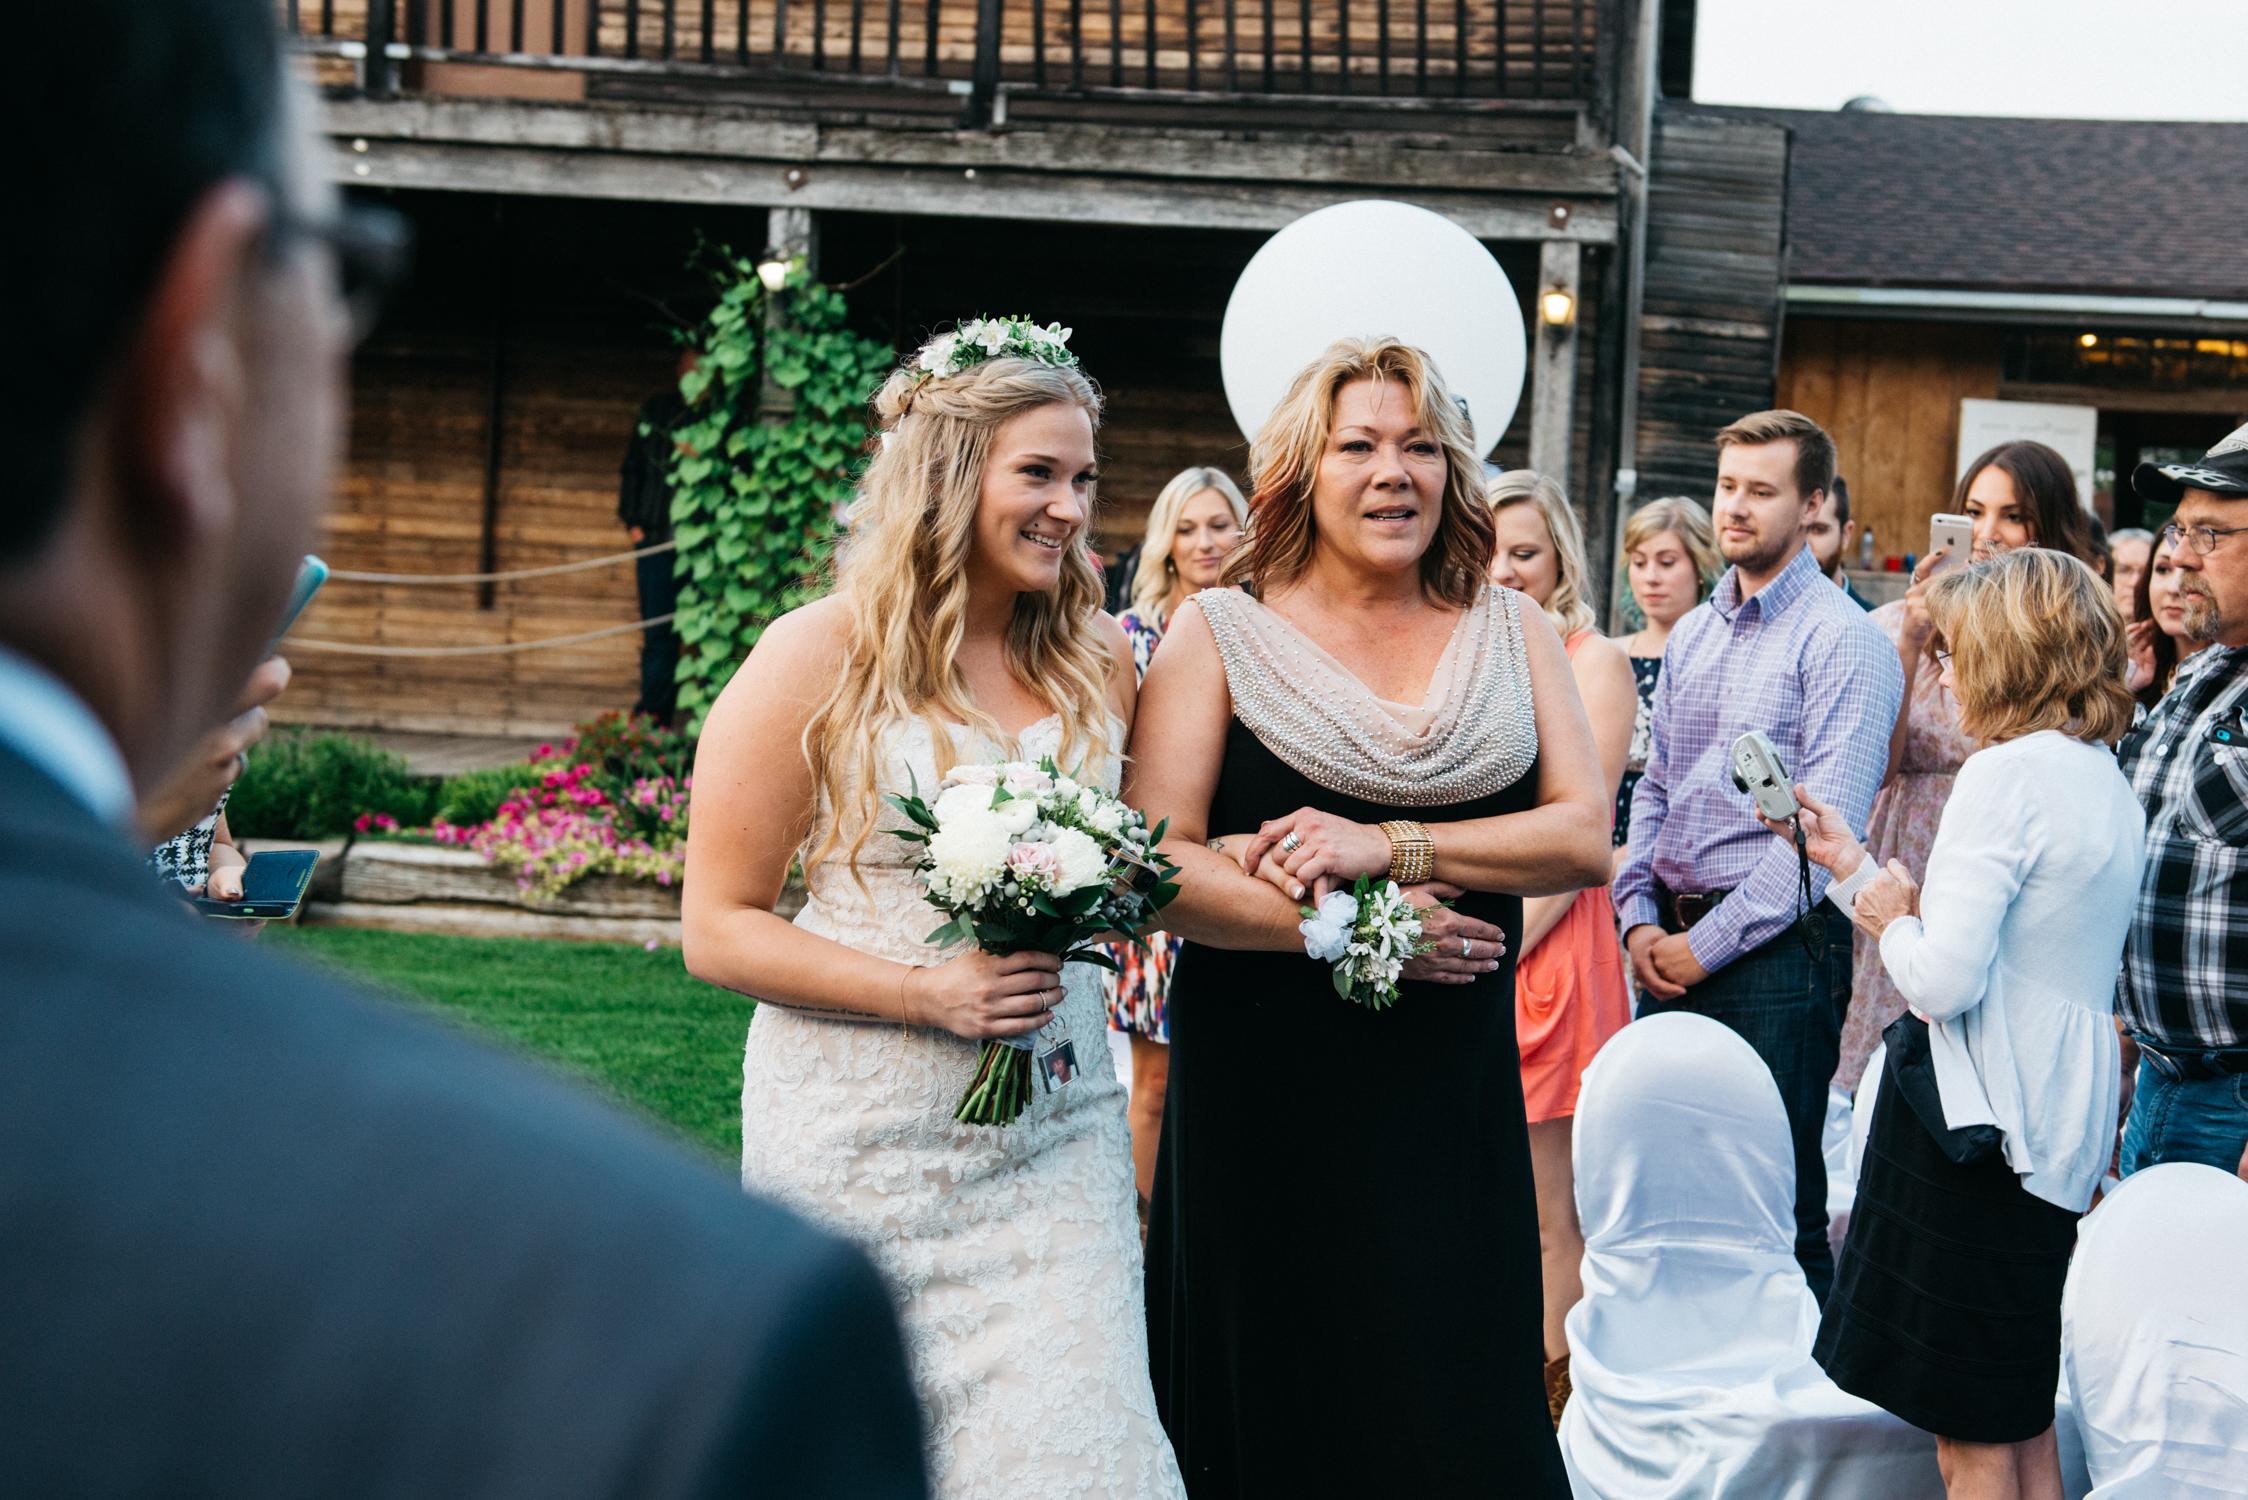 050_saskatoon_saskatchewan_small_town_wedding.jpg